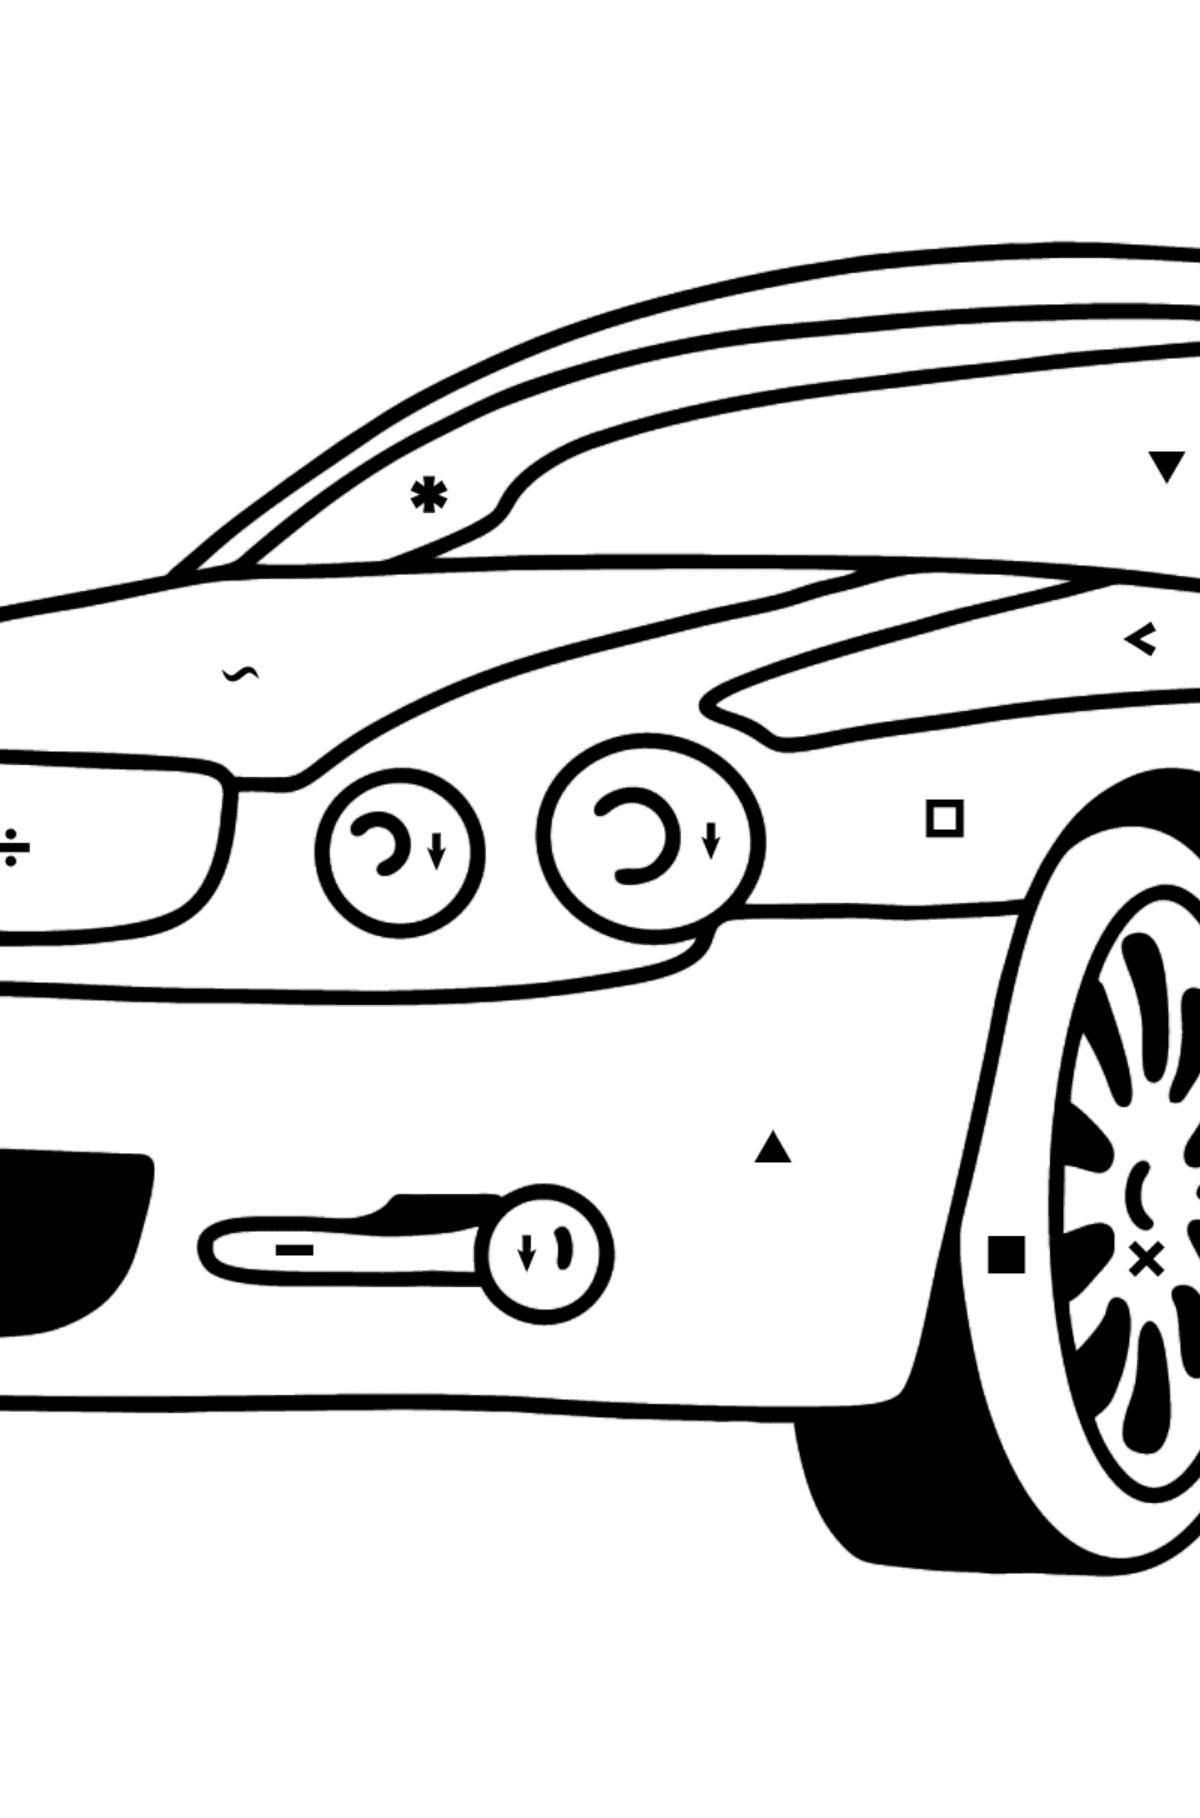 Jaguar GT coloring page - Coloring by Symbols for Kids